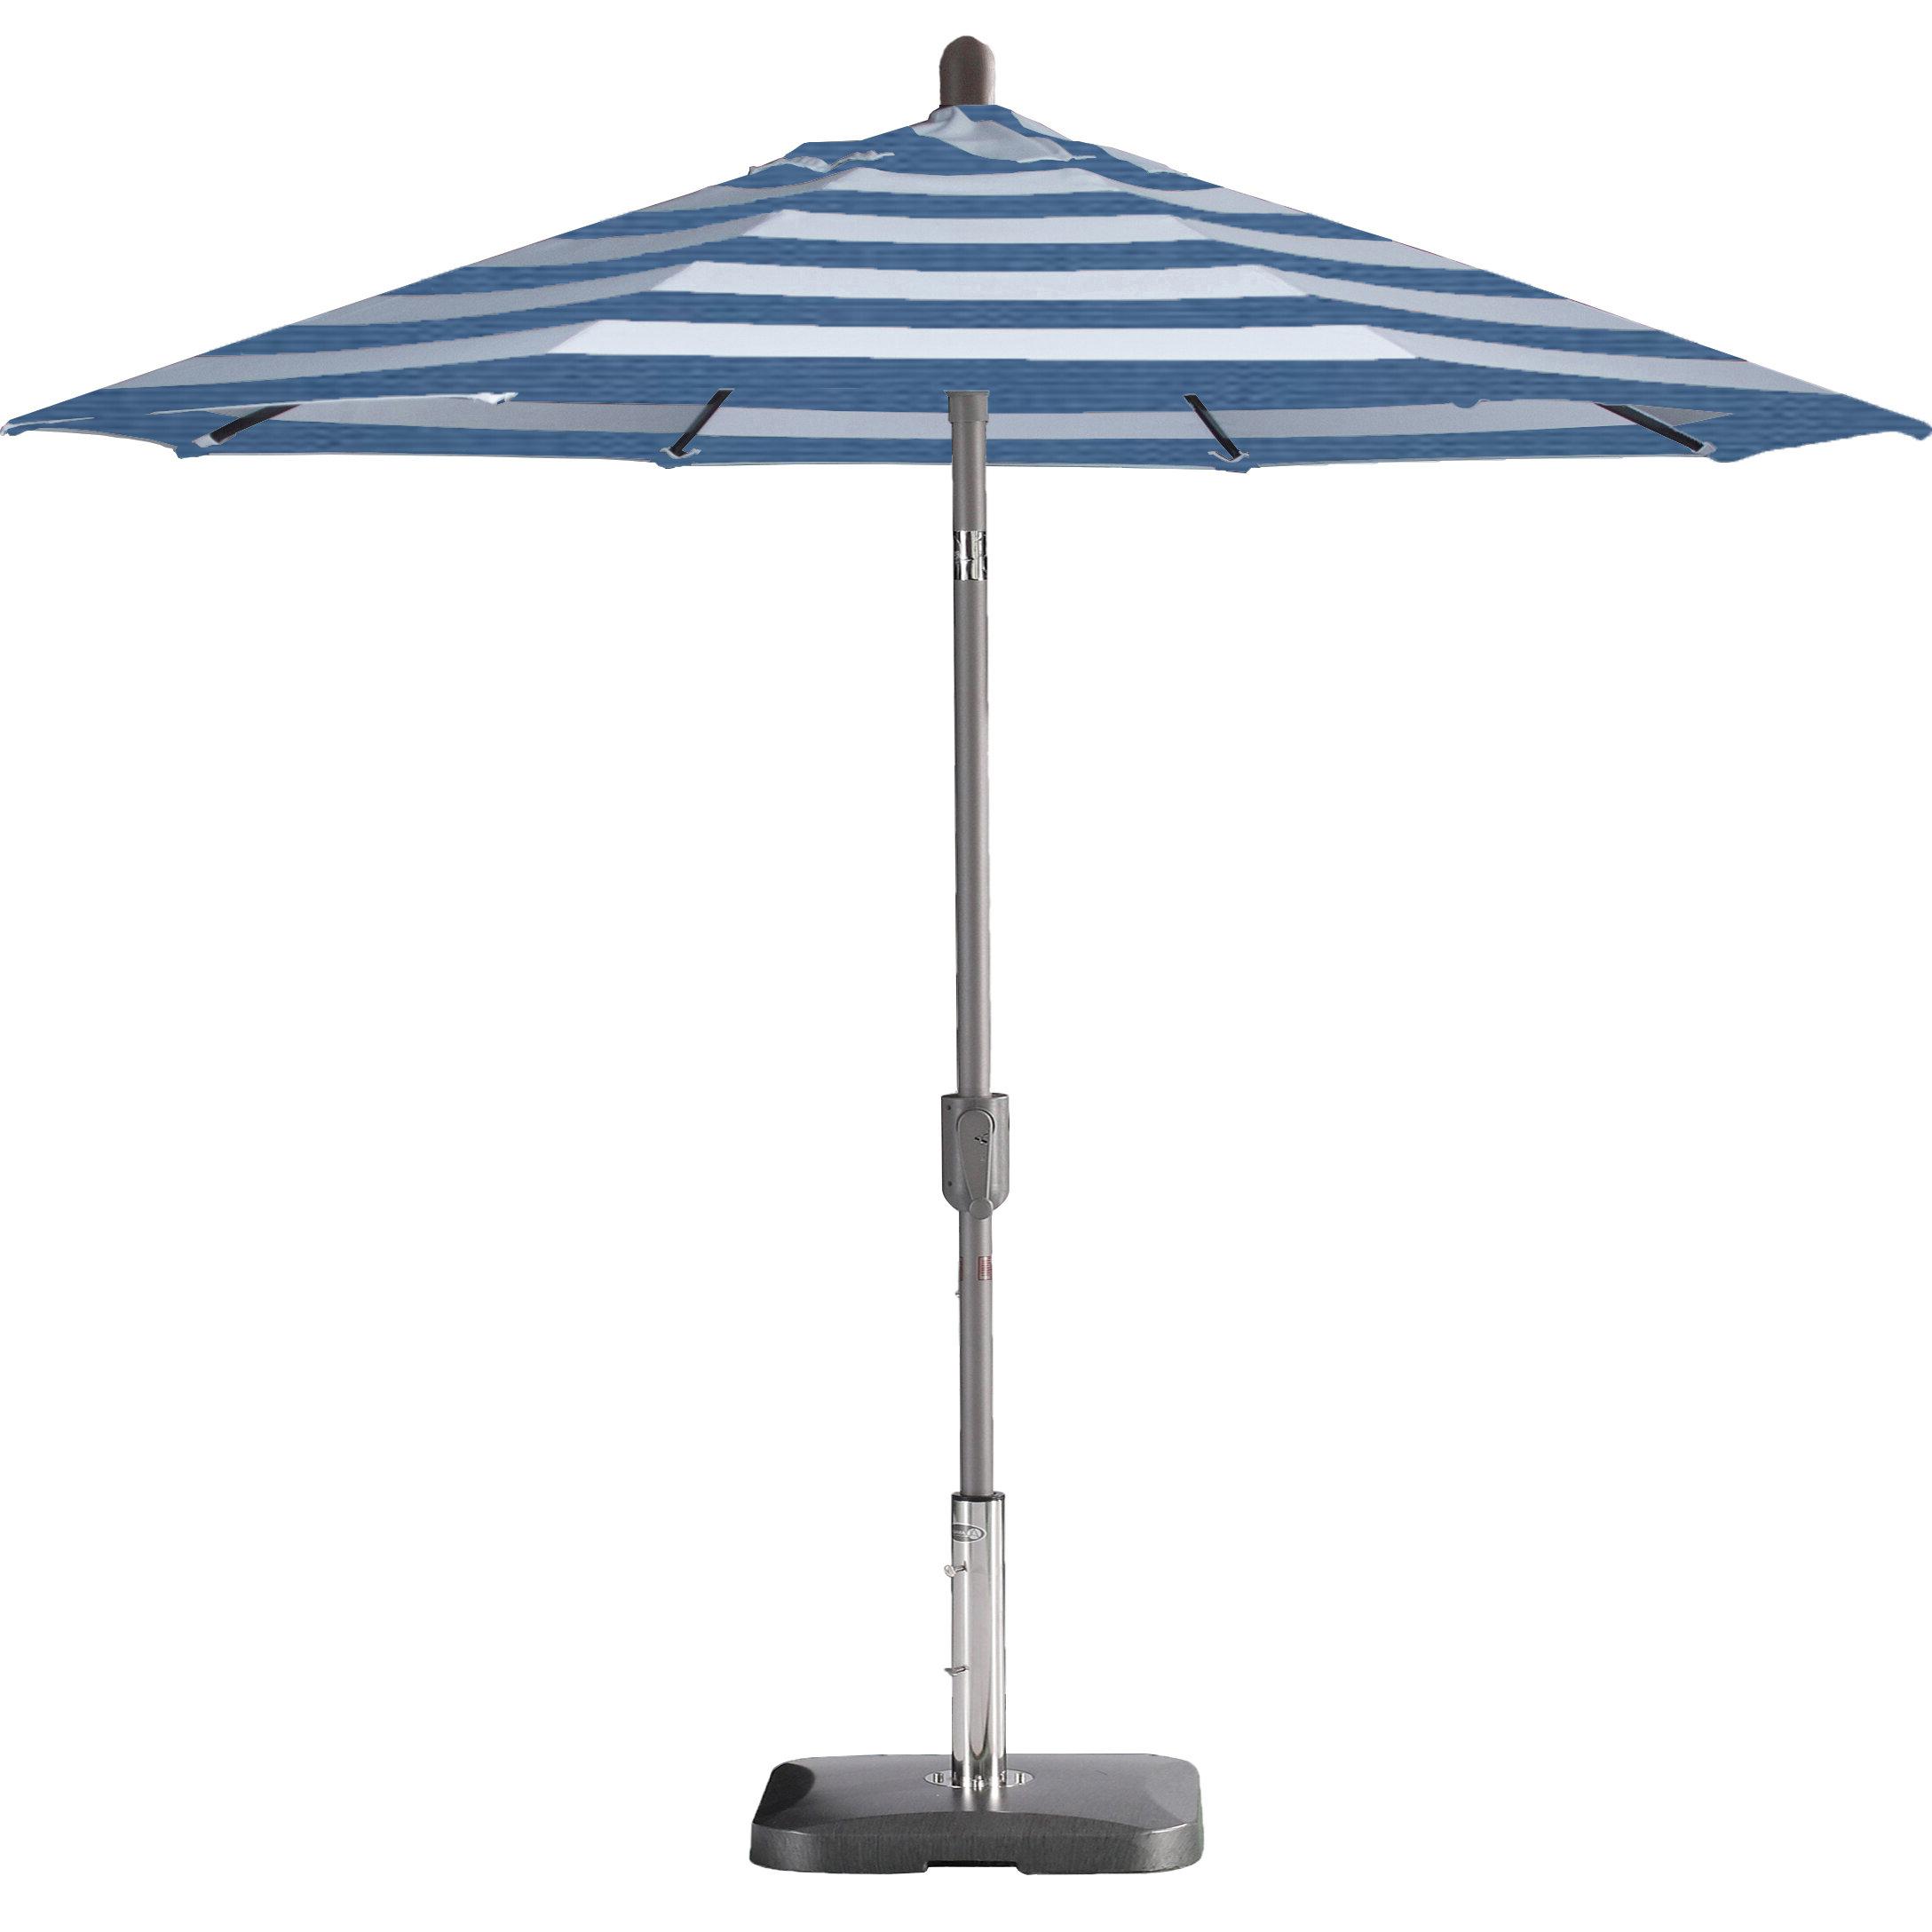 Gainsborough Market Umbrellas With Well Known Wiechmann Push Tilt 9' Market Sunbrella Umbrella (View 9 of 20)